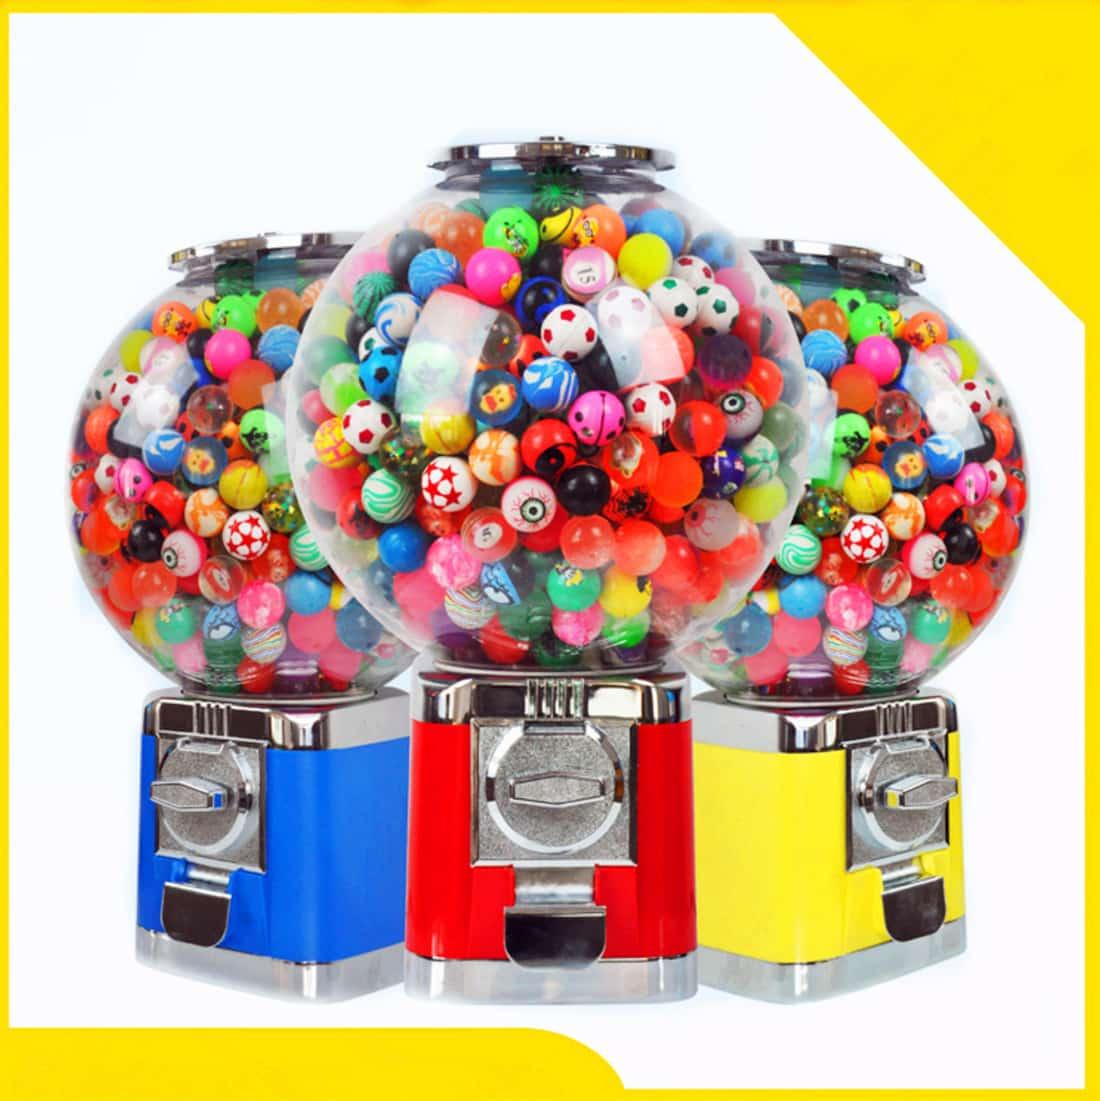 Bouncy ball machine,vending machine,buy bouncy ball, bouncy ball for sale (6)